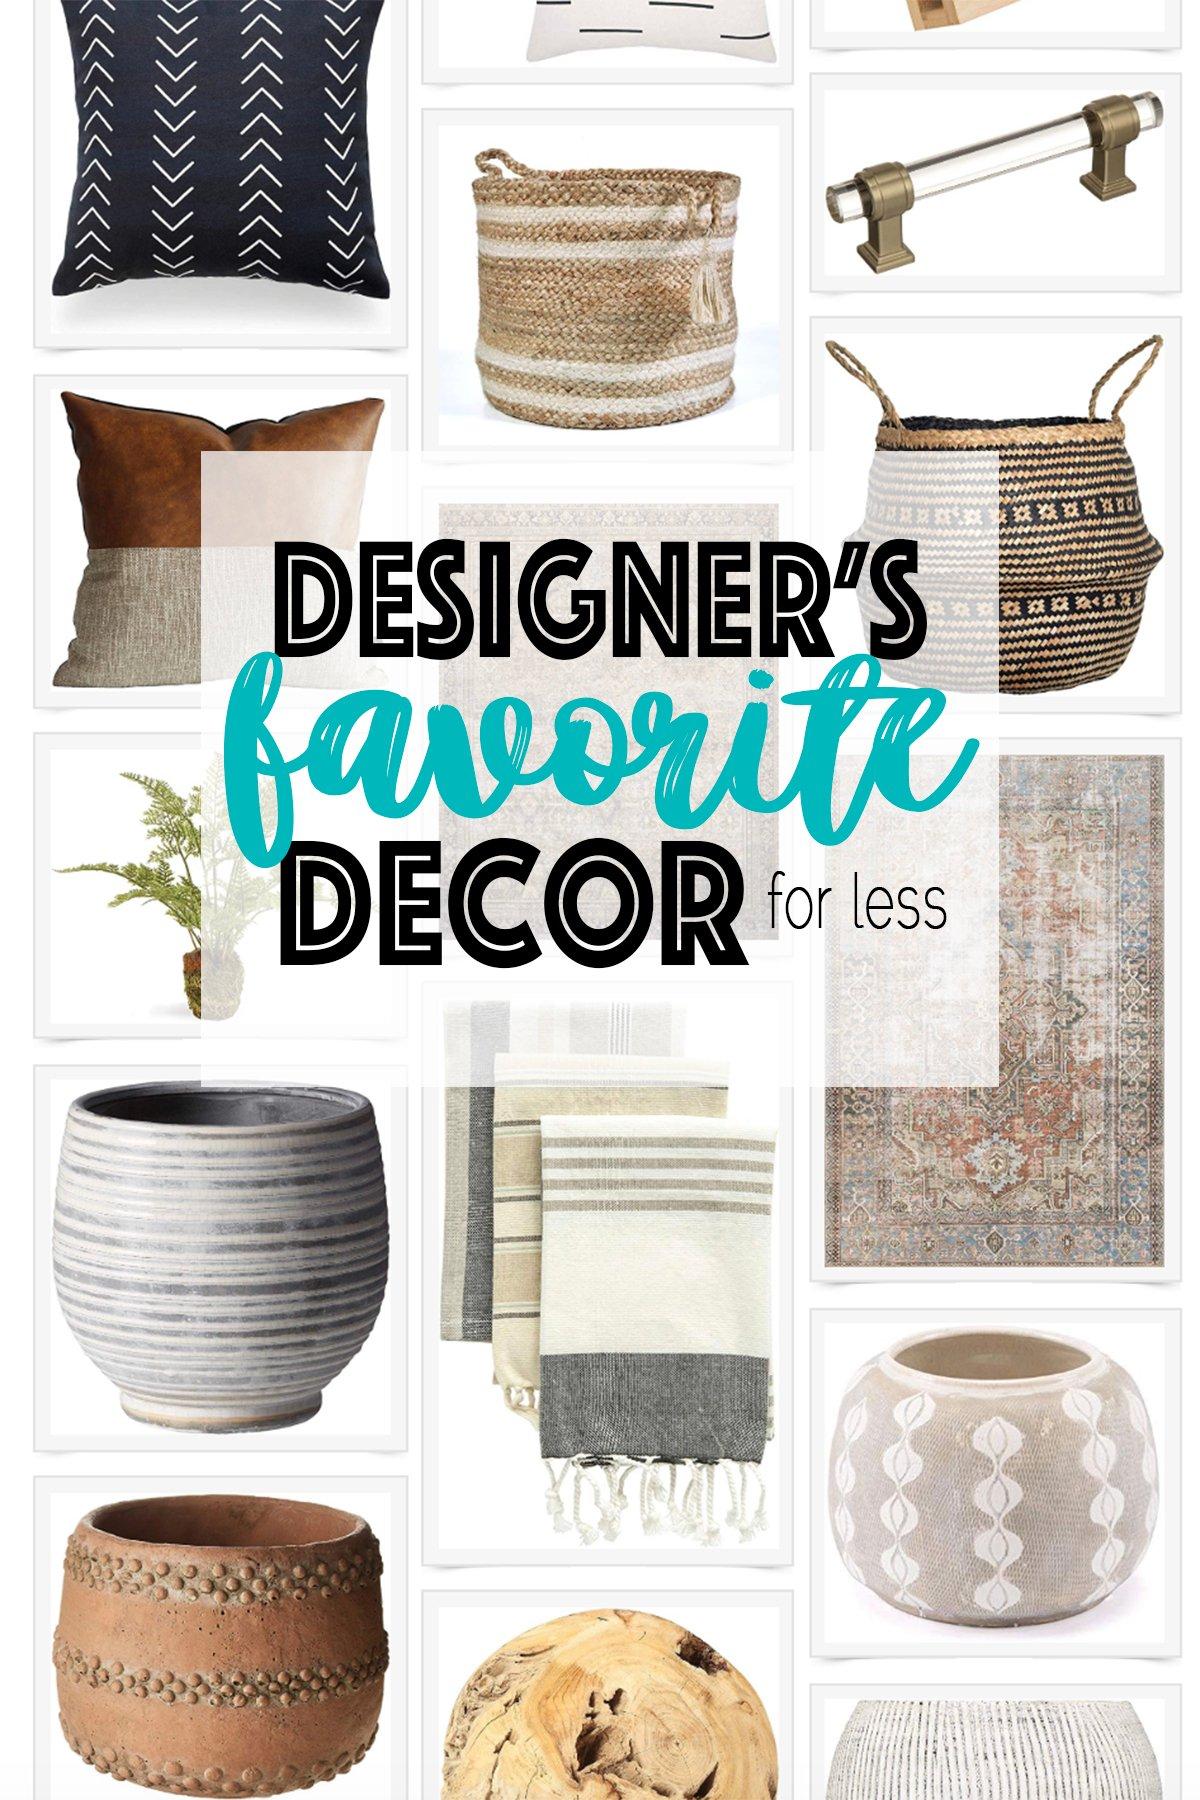 Designers favorite decor for less